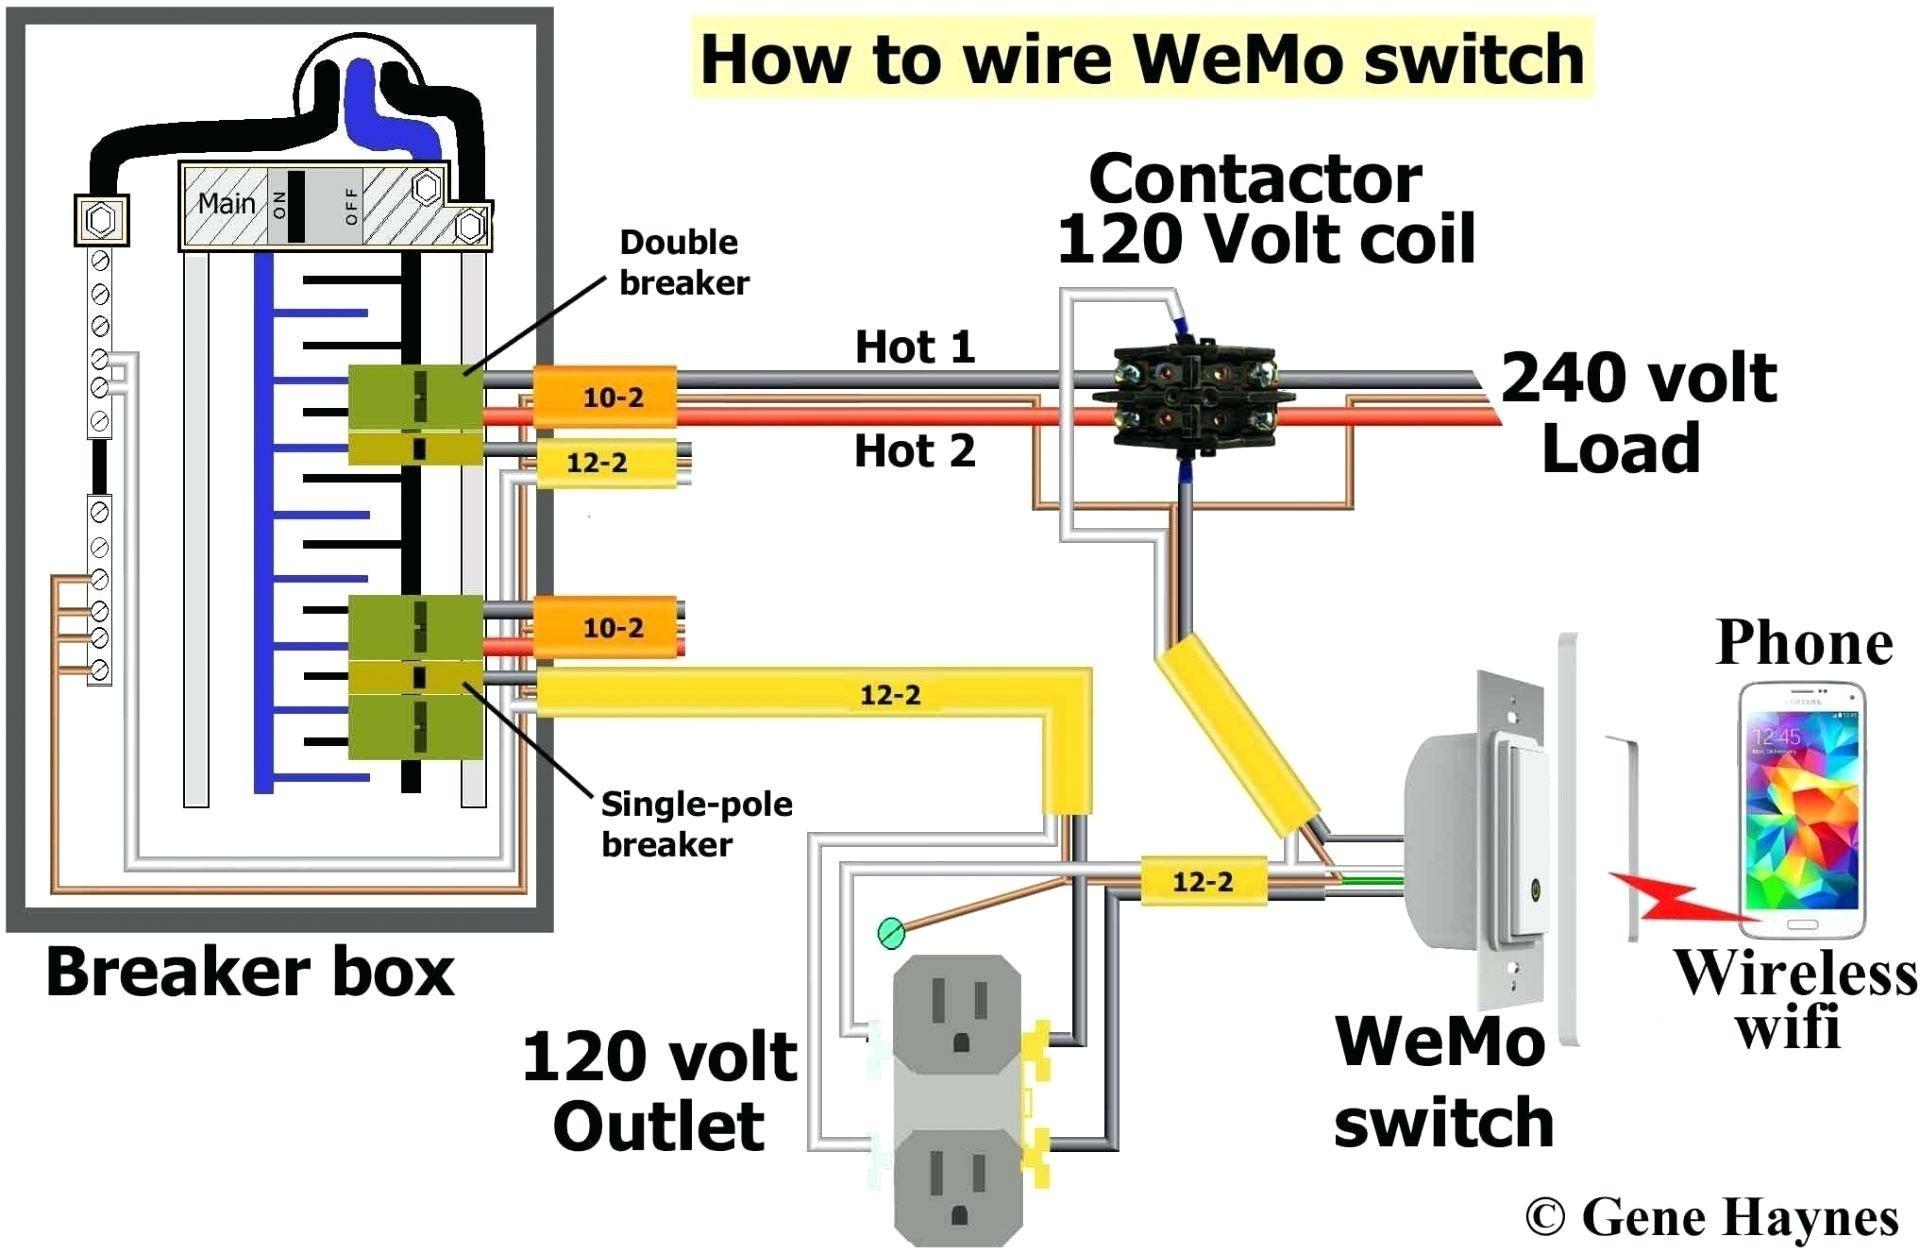 Rj25 Wiring Diagram Simple Wiring Diagram Shematics Cat 5E RJ11 Wiring Diagram Rj 11 Wiring